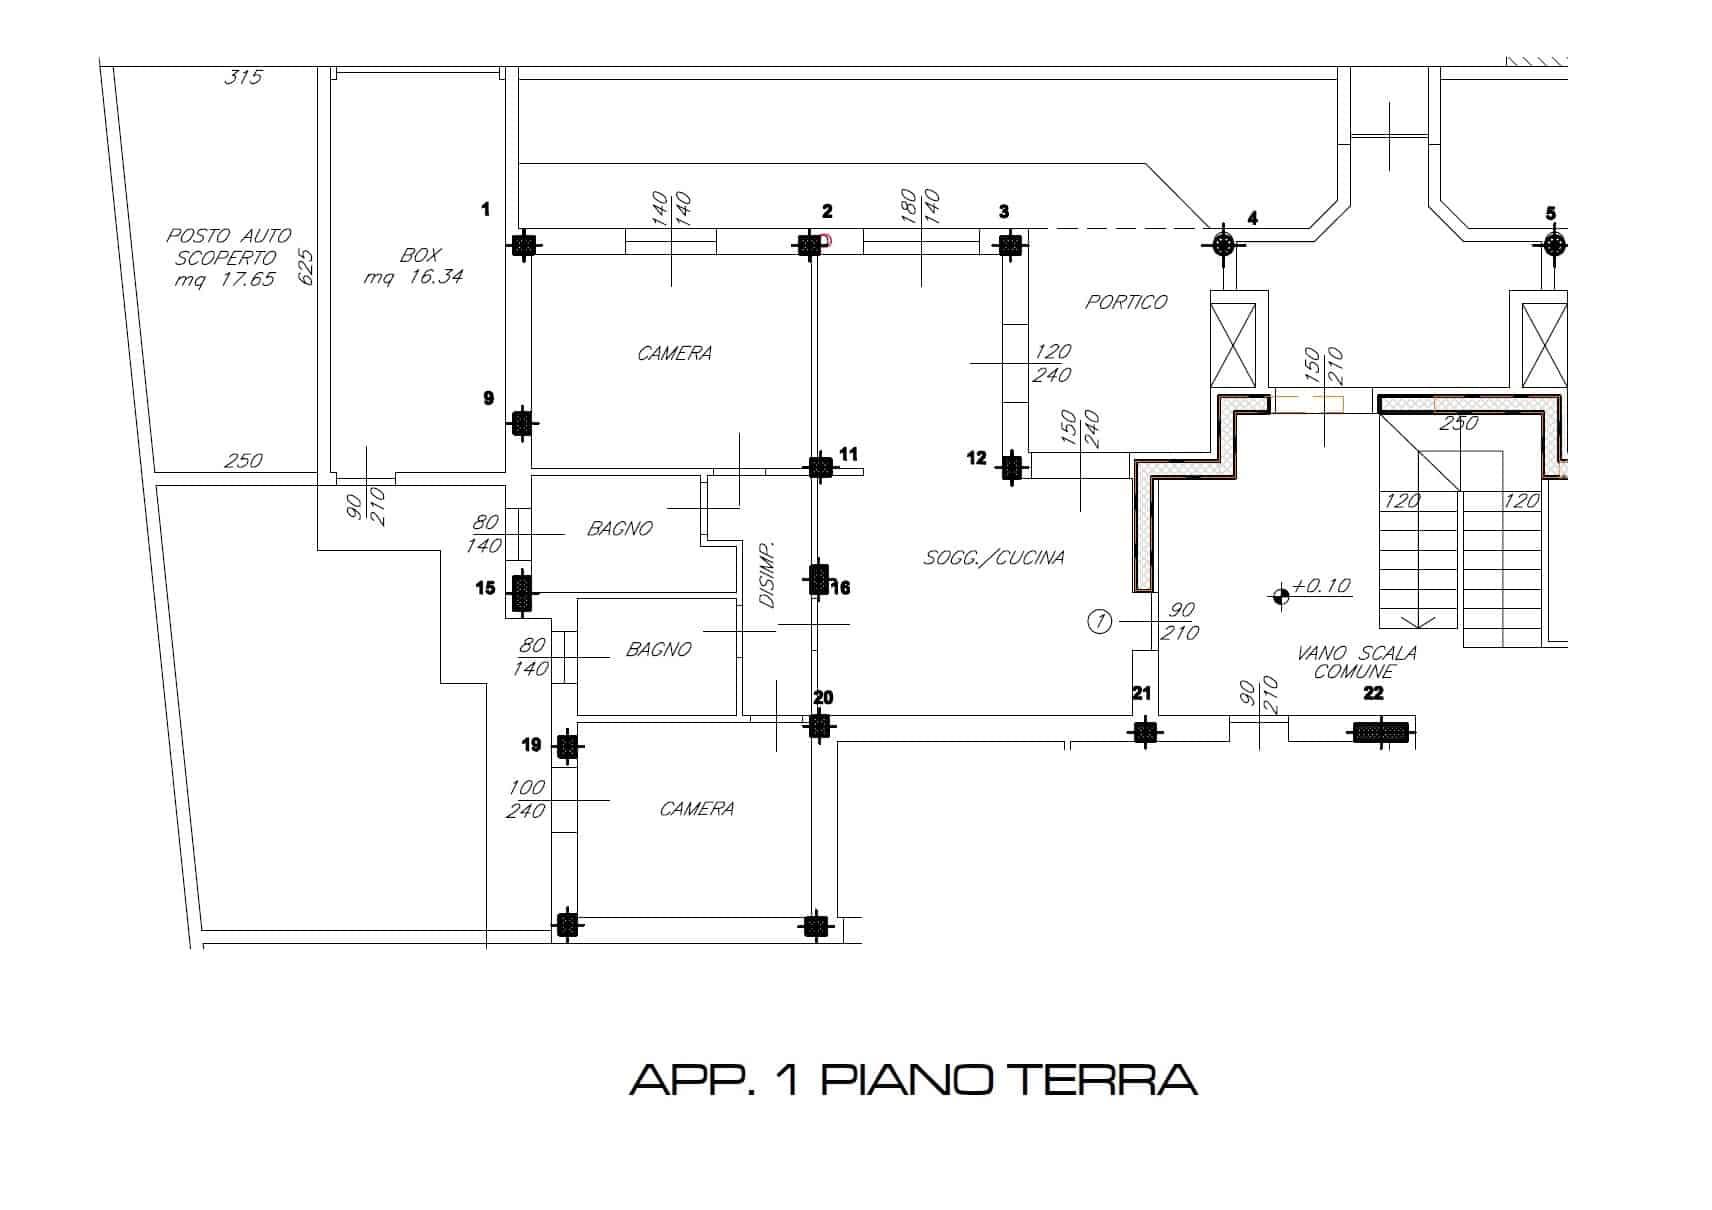 App. 1 PIANO TERRA